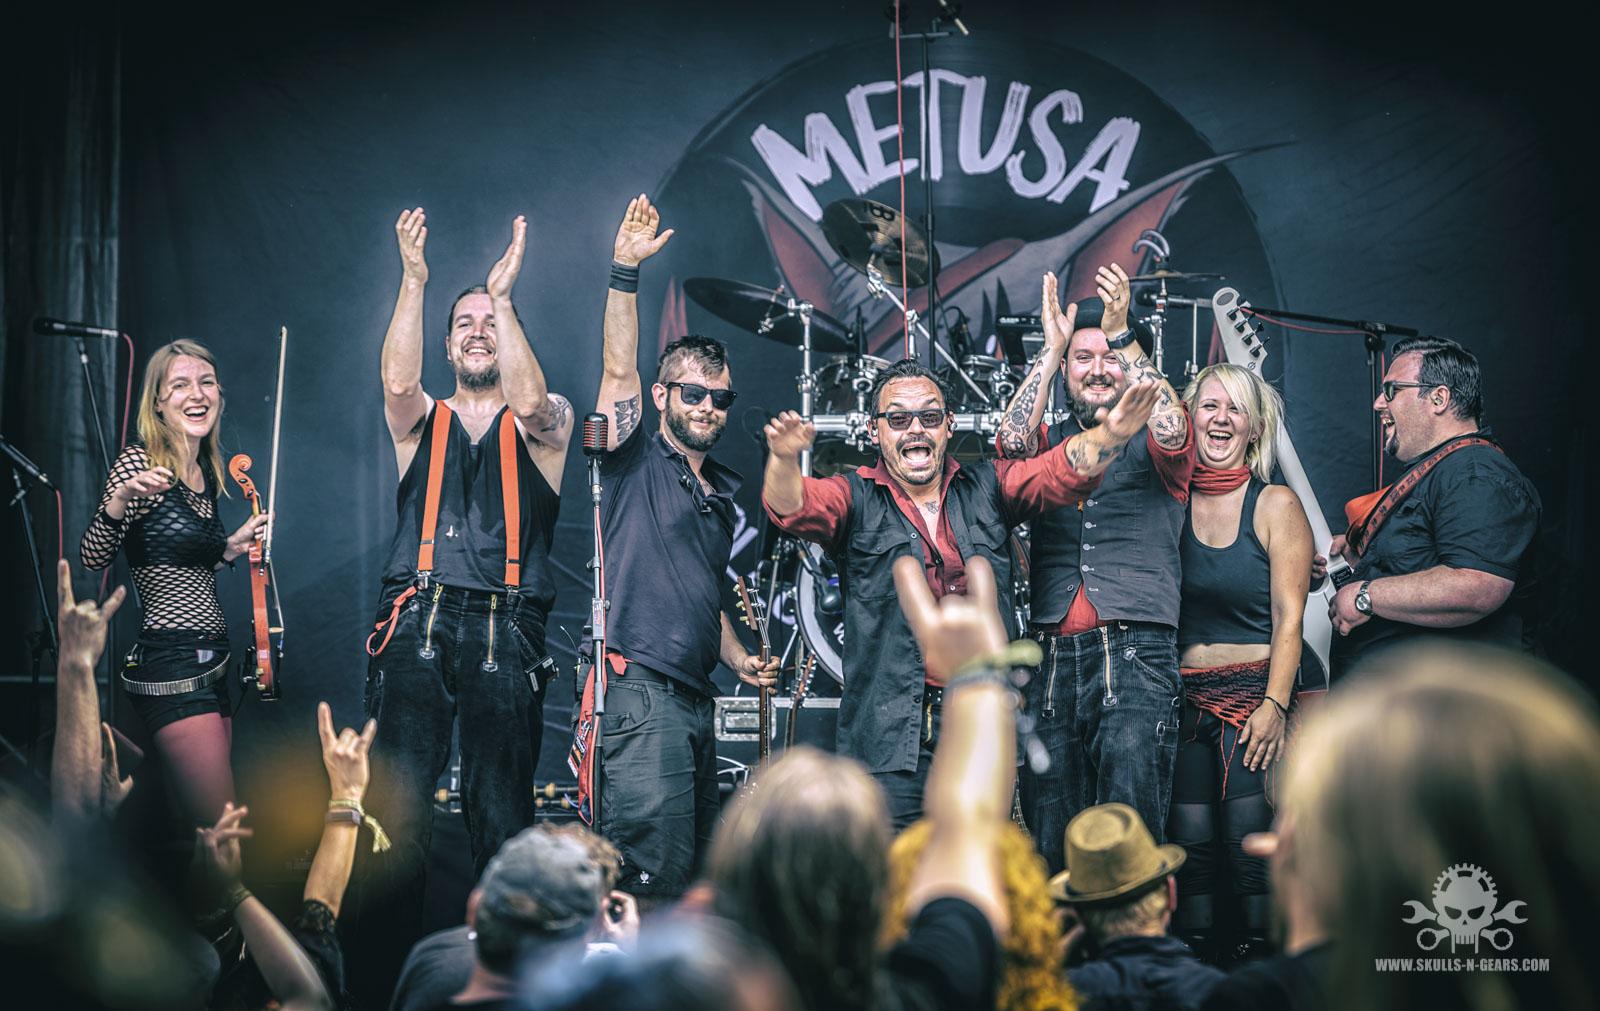 Schlosshof Festival - Metusa -23